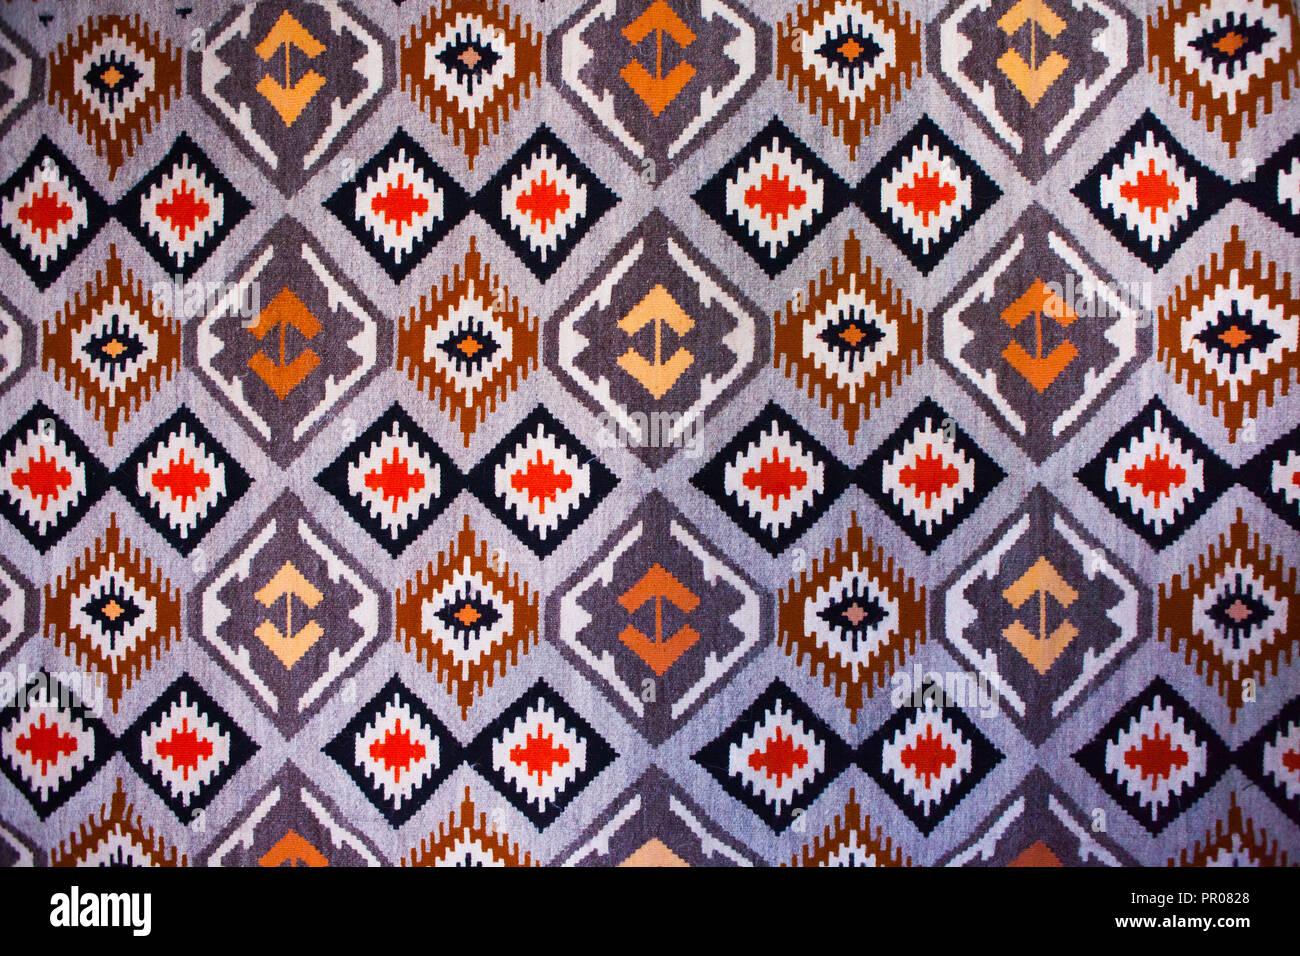 Carpet pattern texture Cream Romanian Folk Seamless Pattern Ornaments Romanian Traditional Embroidery Ethnic Texture Design Traditional Carpet Design Carpet Ornaments Rustic Alamy Romanian Folk Seamless Pattern Ornaments Romanian Traditional